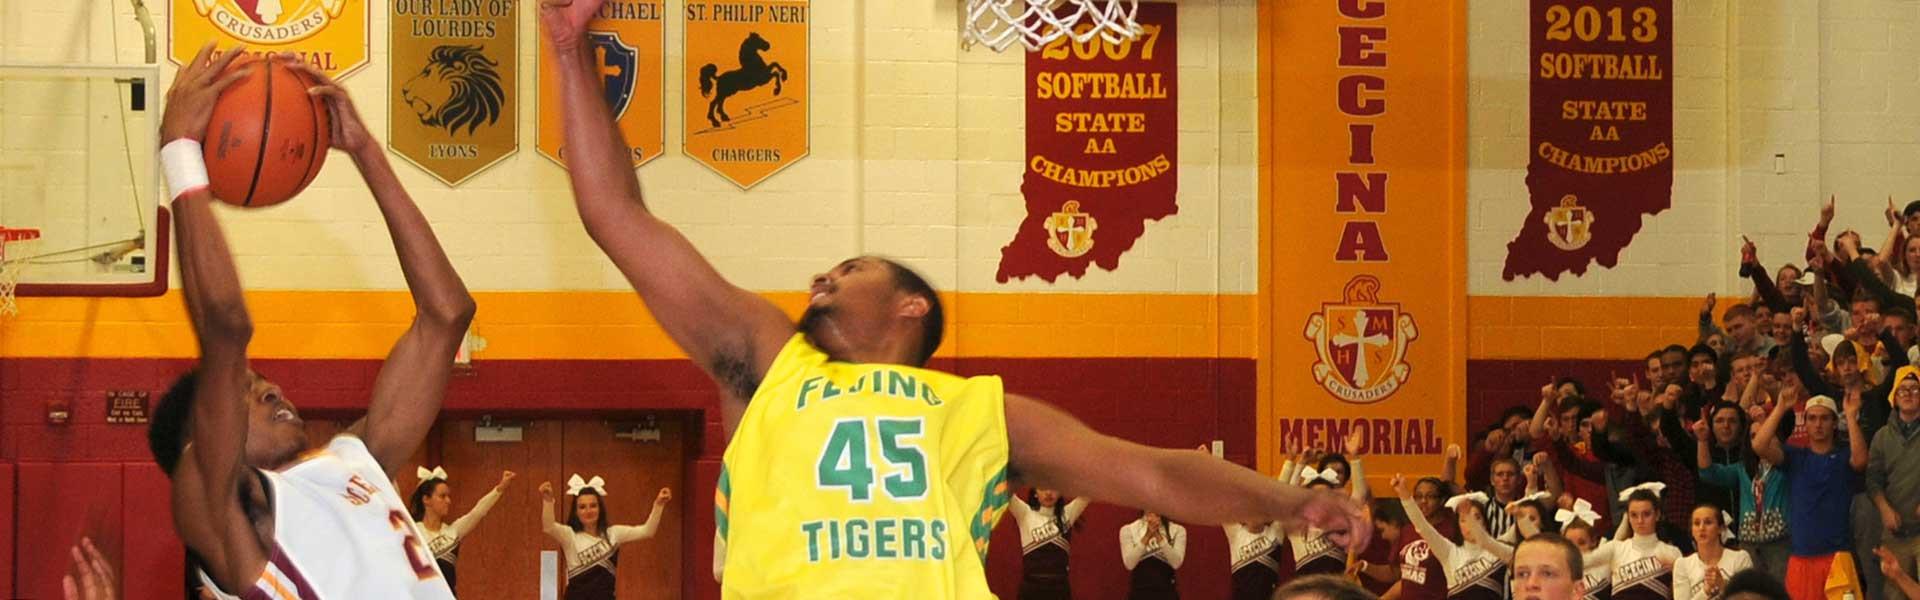 Scecina Memorial High School's students basketball match